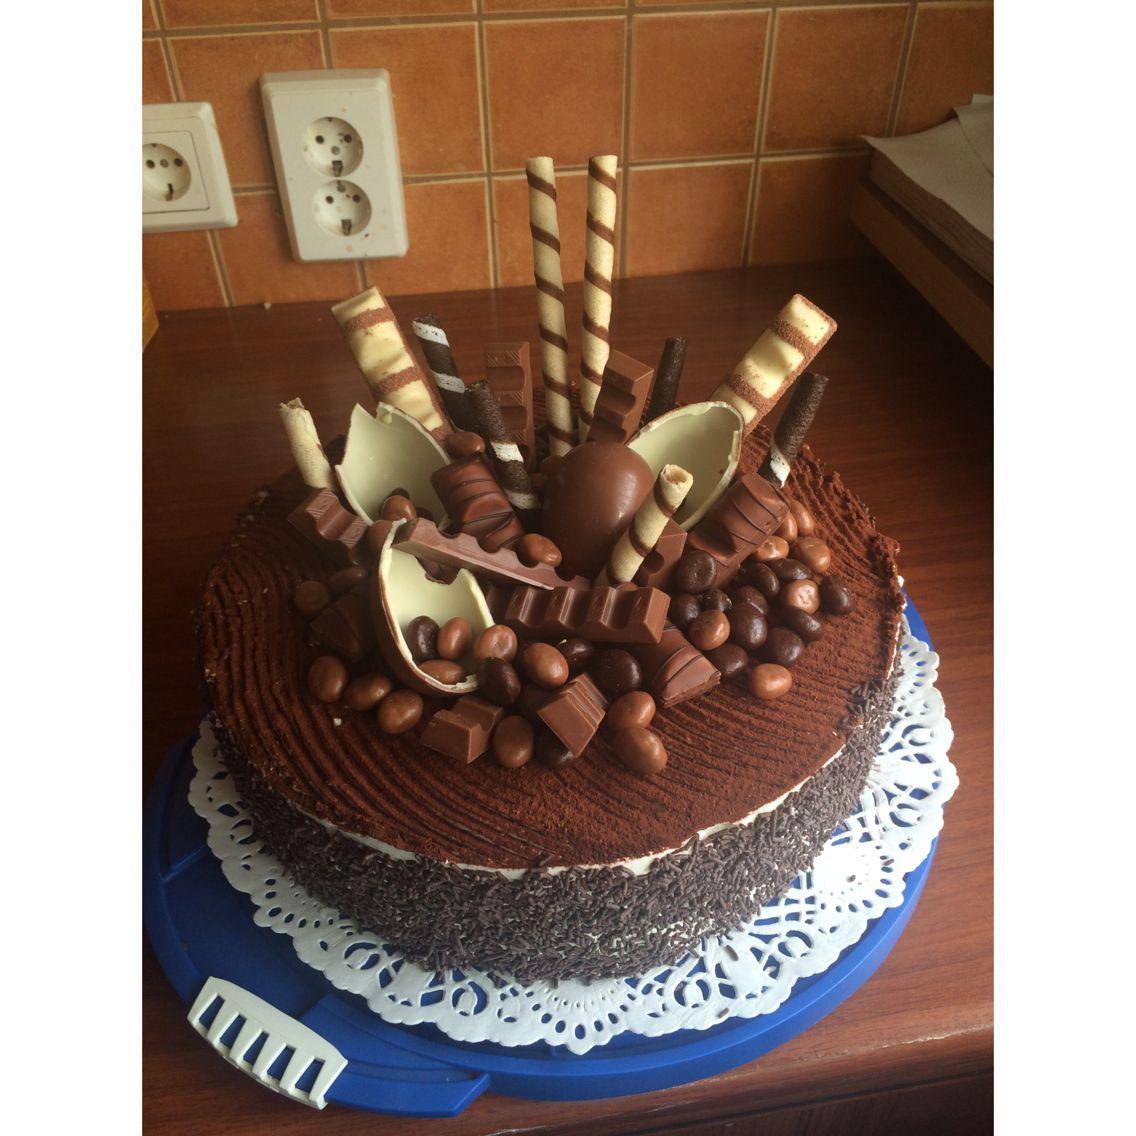 Kinder bueno cake cakes desserts pinterest g teau - Gateau deco kinder ...